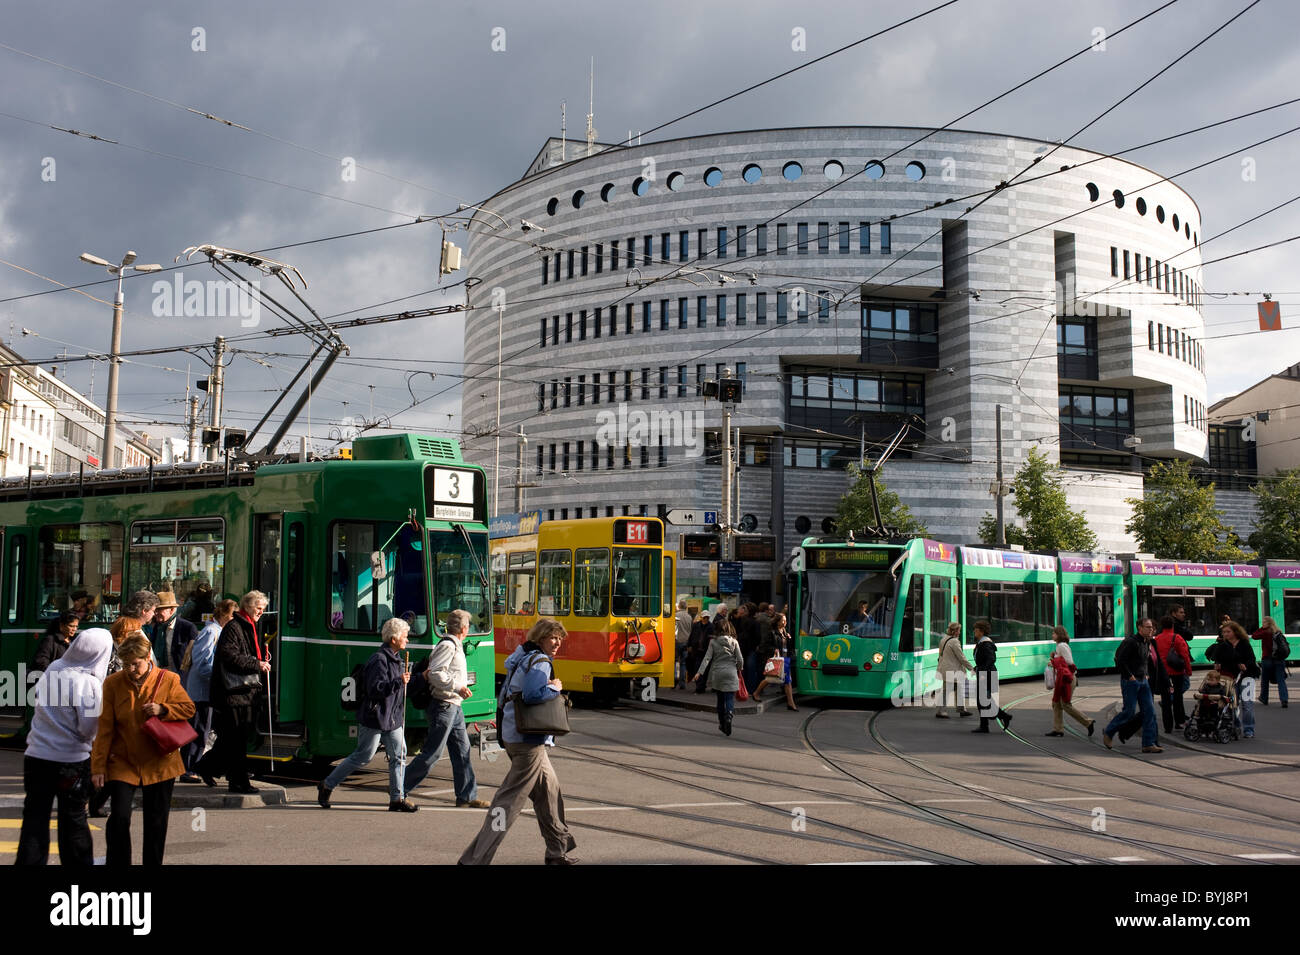 Bank for International Settlements in Aeschenplatz, Basel, Switzerland - Stock Image